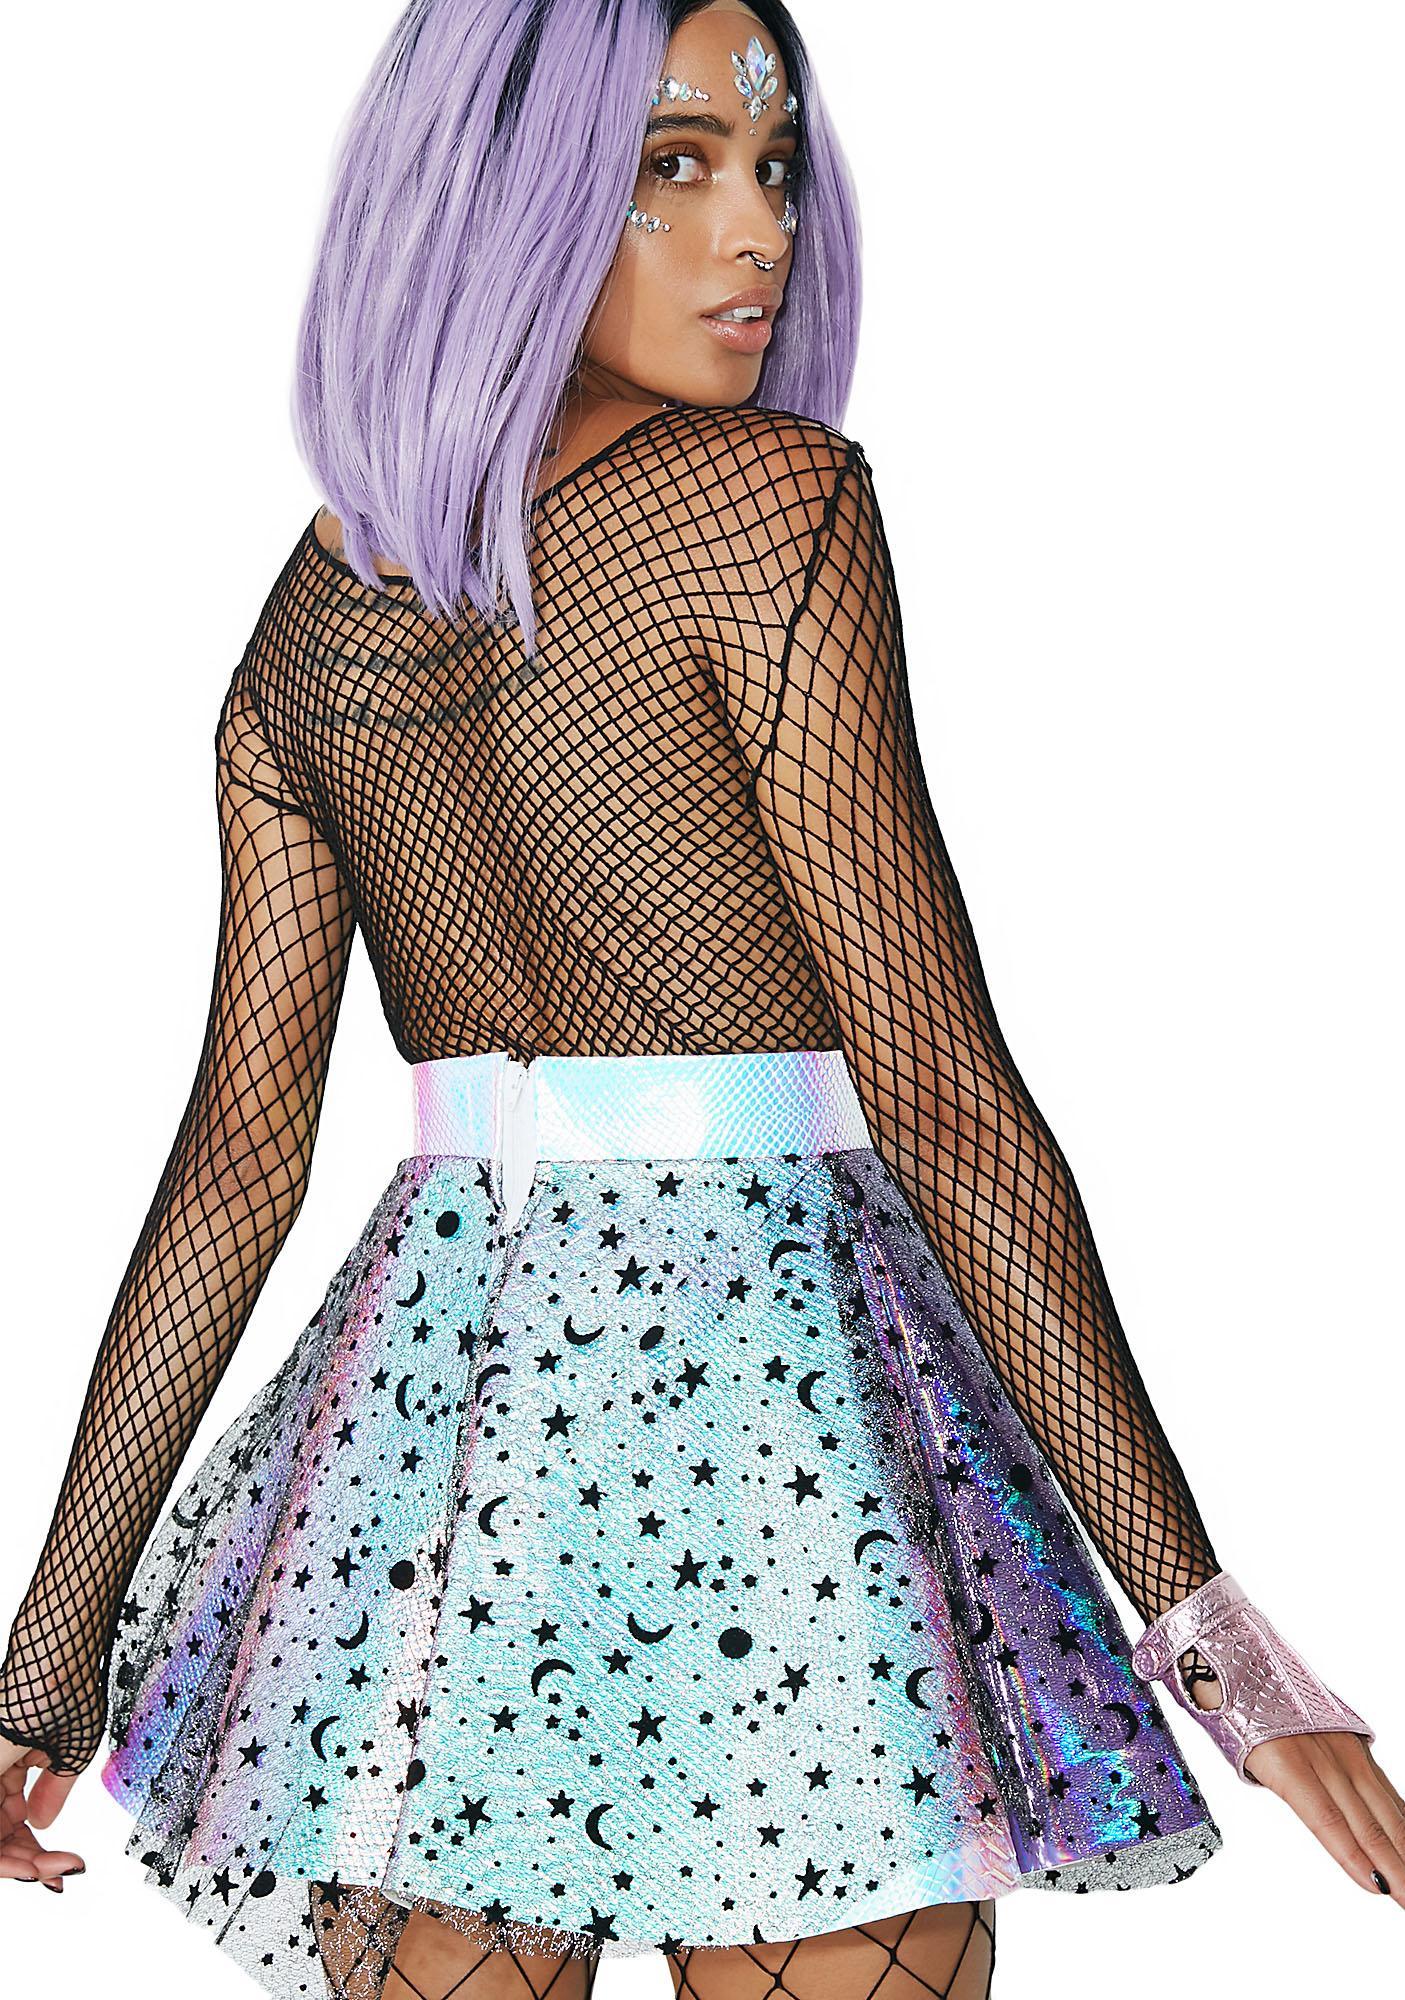 Cosmic Unicornz Holographic Moon Star Skirt